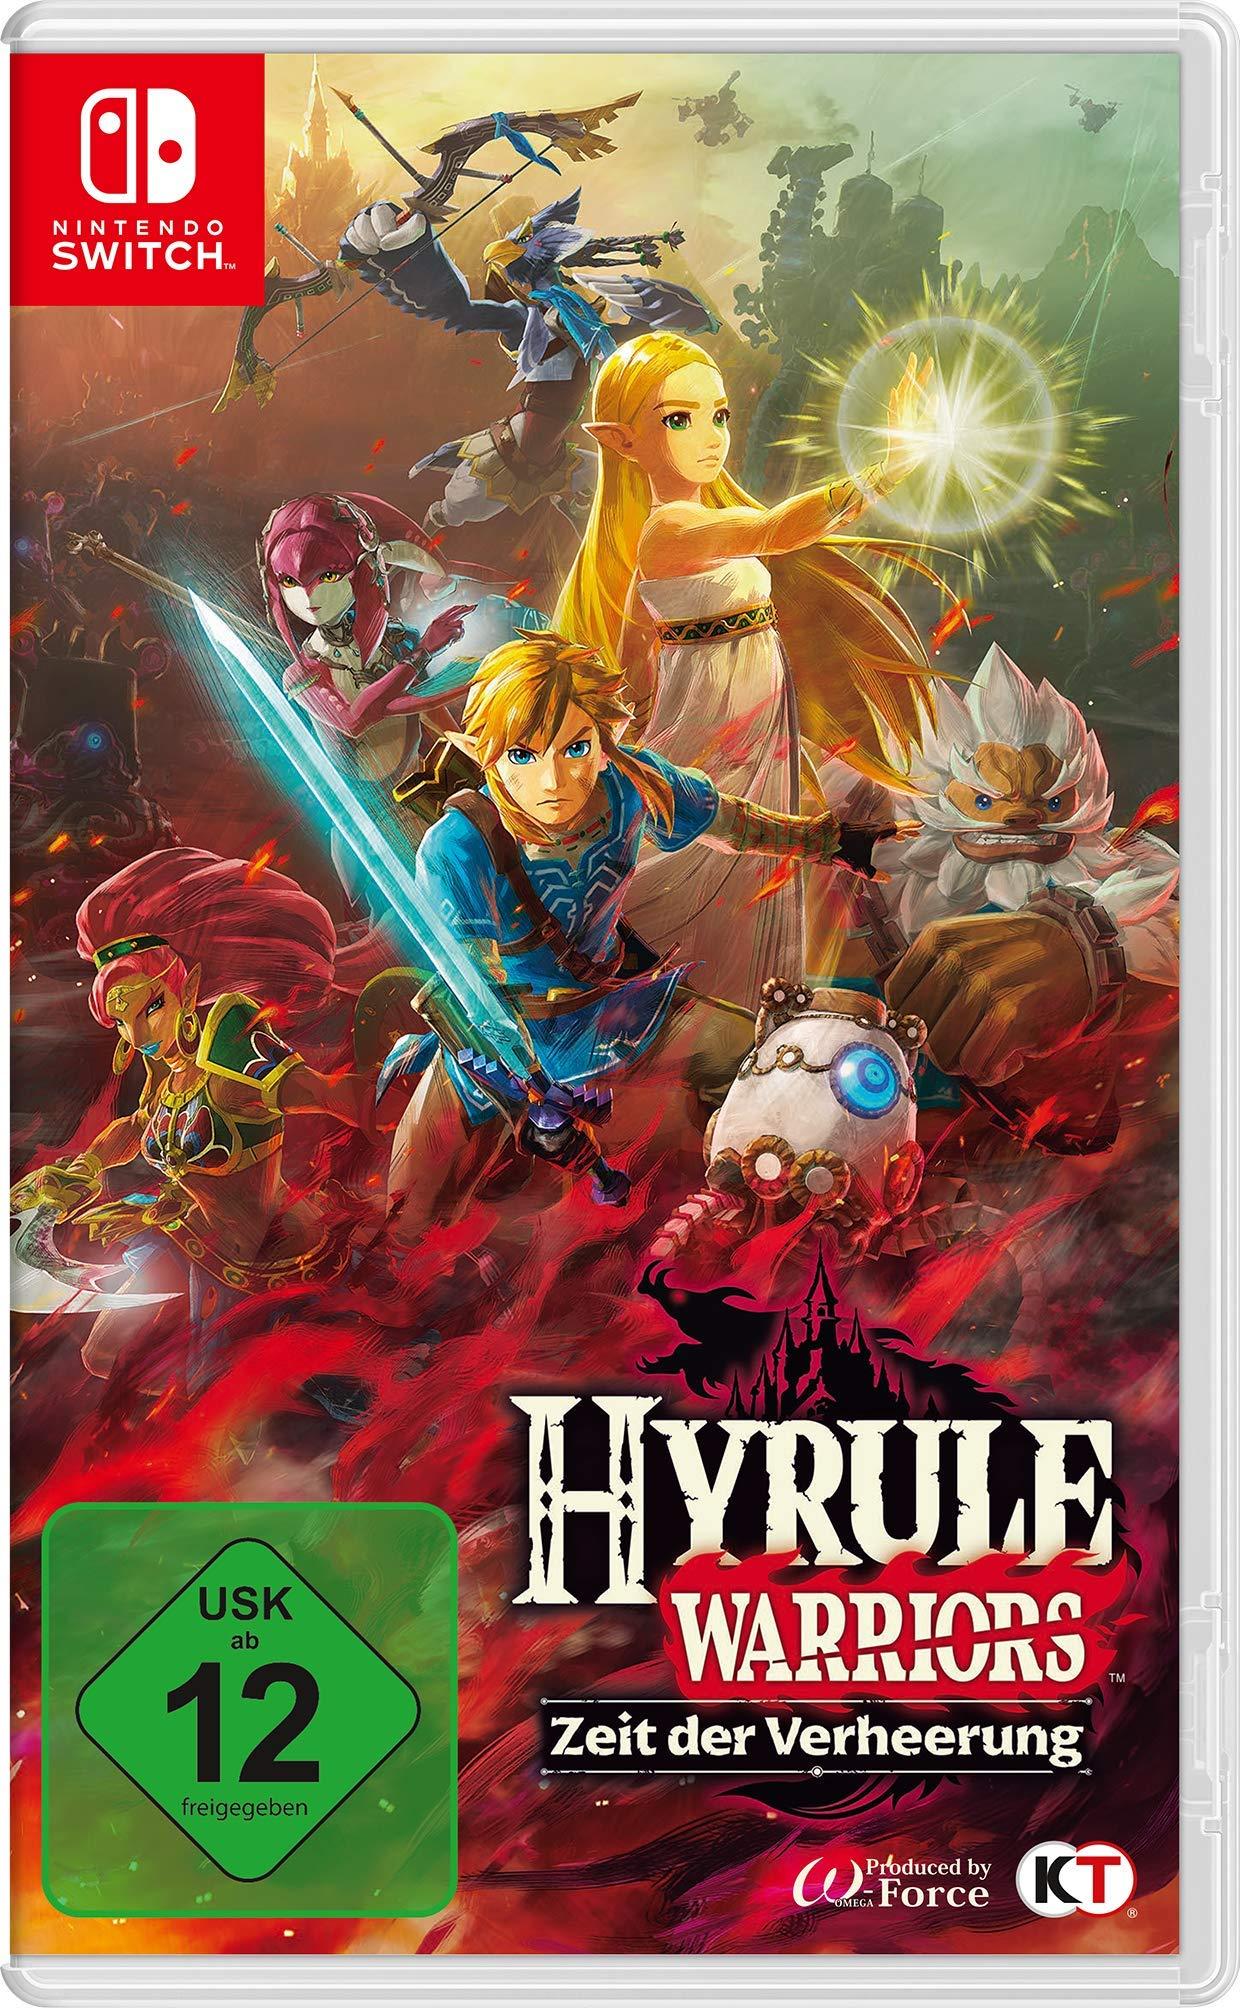 Hyrule Warriors Zeit Der Verheerung Fur Nintendo Switch Amazon Co Uk 0045496427016 Books